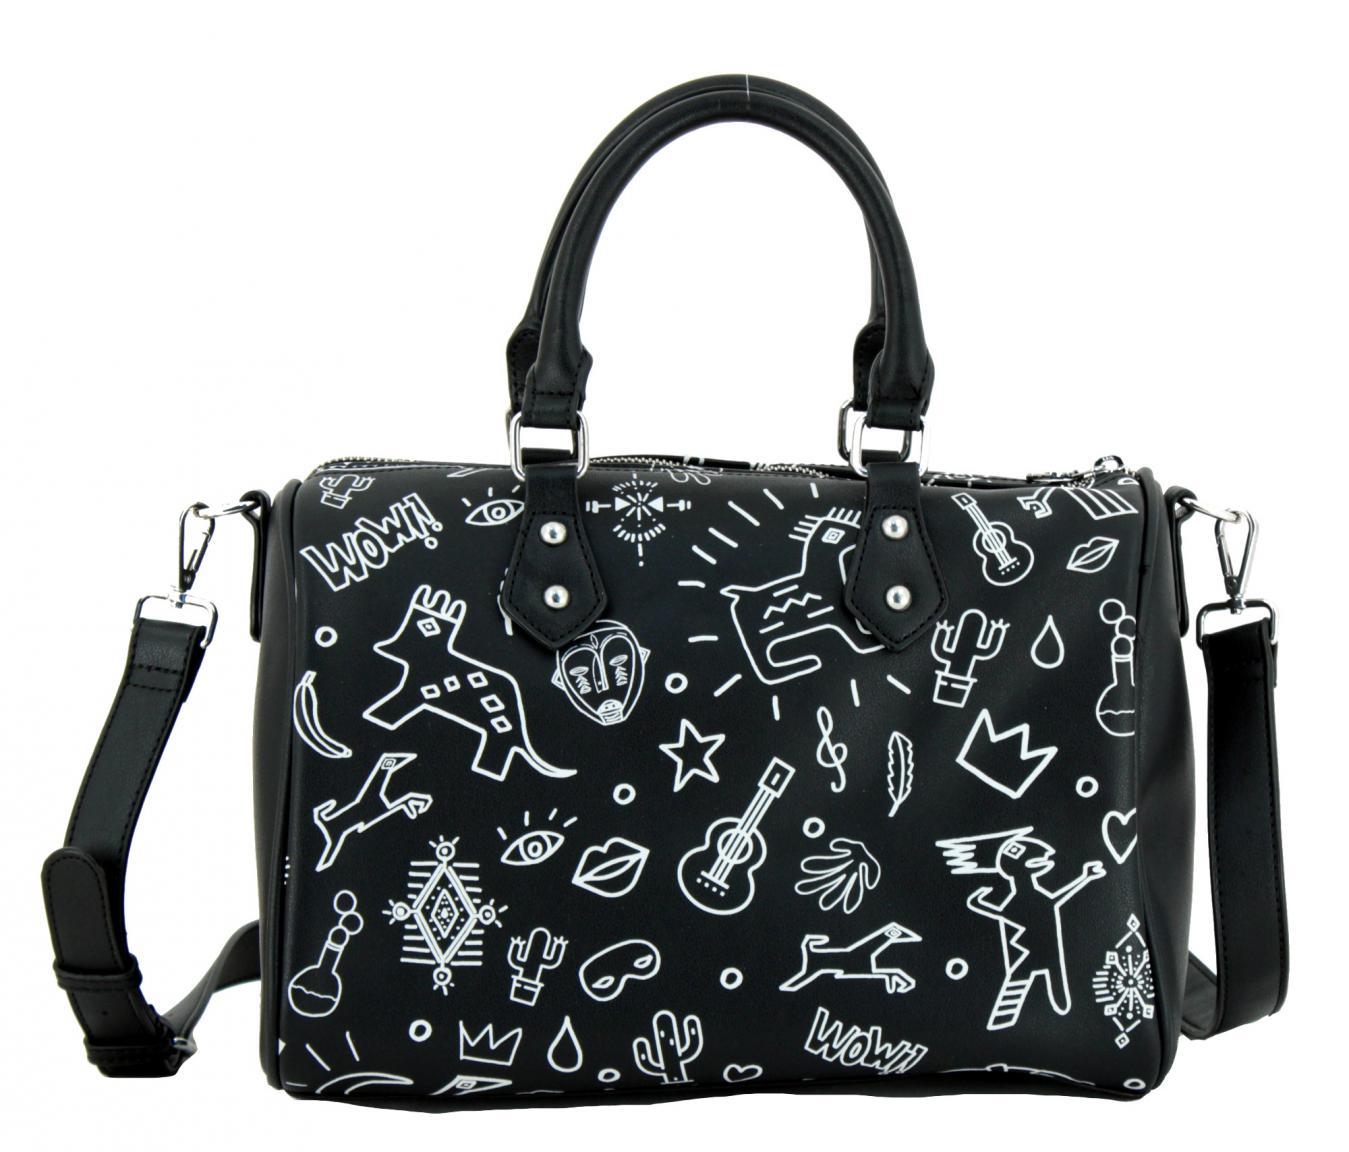 Desigual Bowling Bag Chula Zeichnung Schriftzug schwarz